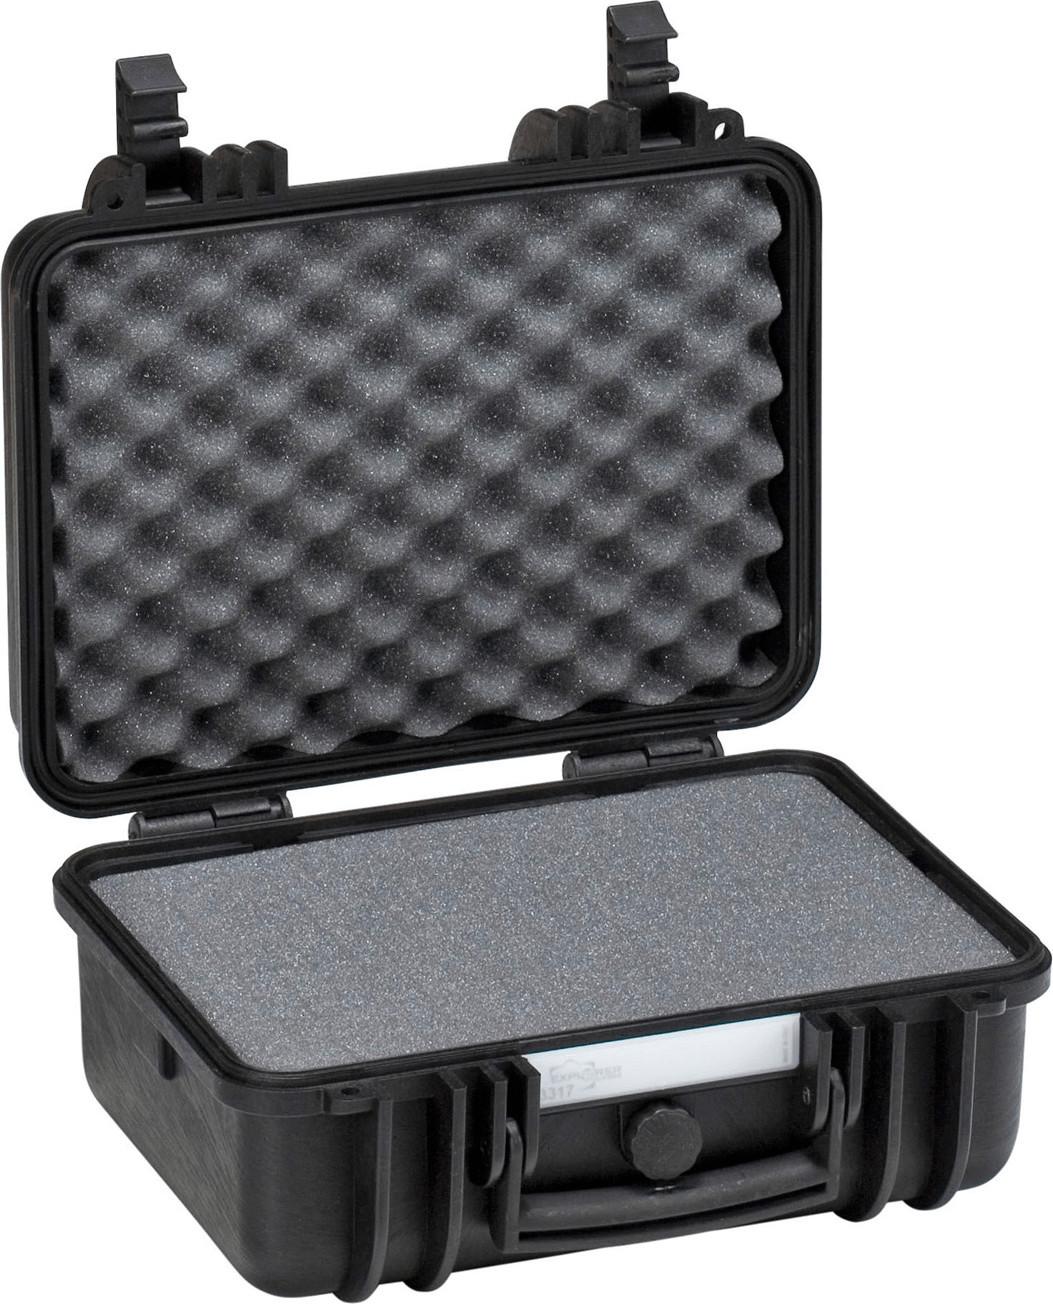 Image of Explorer Cases 3317